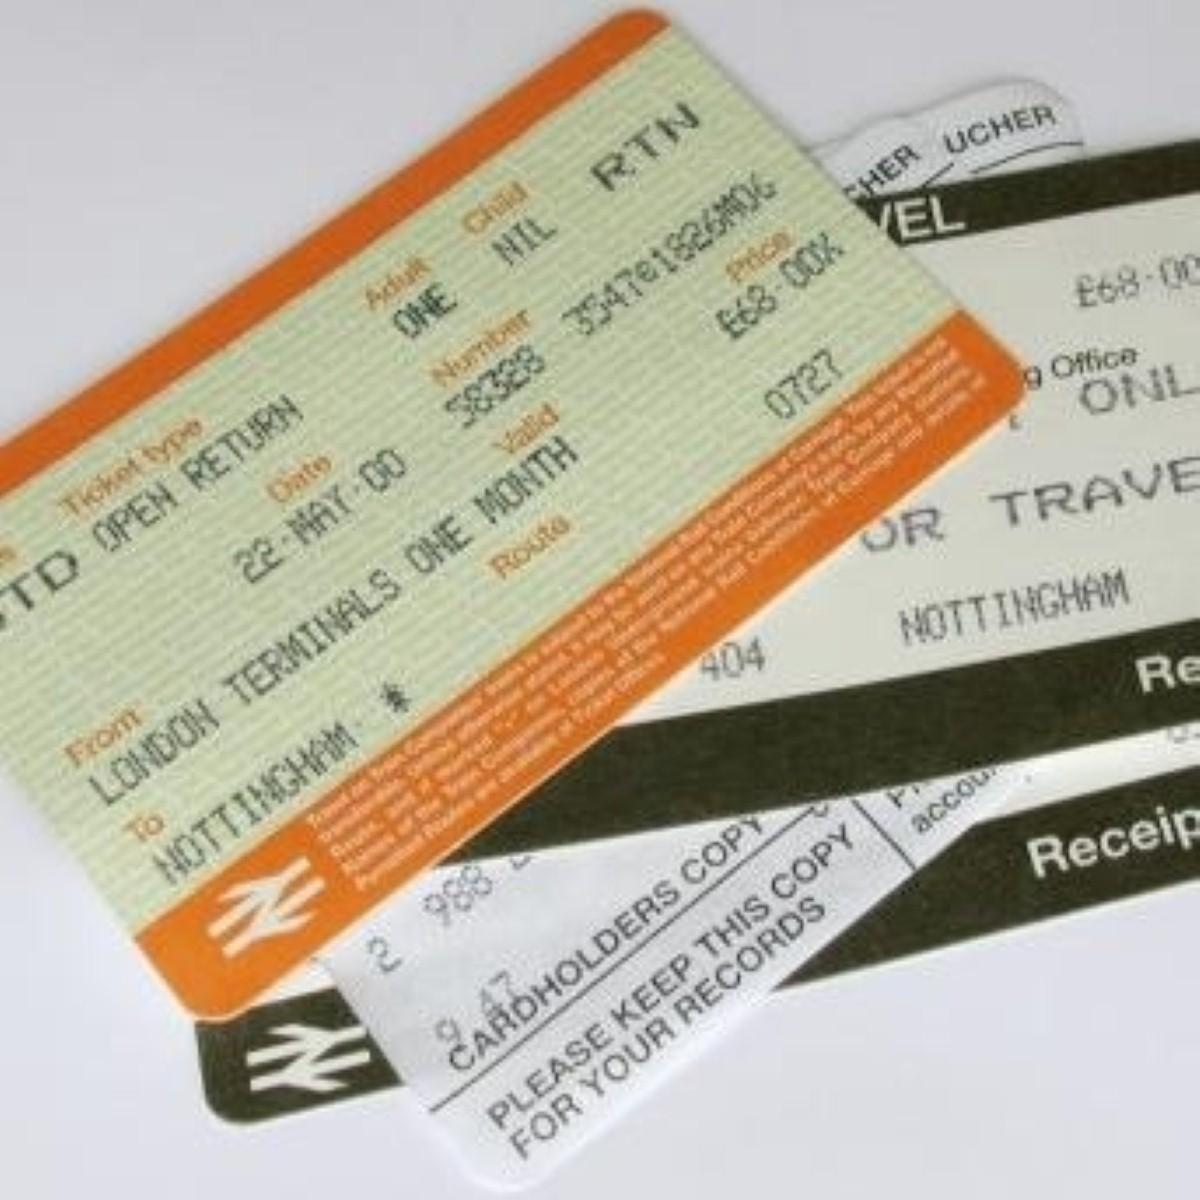 Train season tickets set to rise again today.